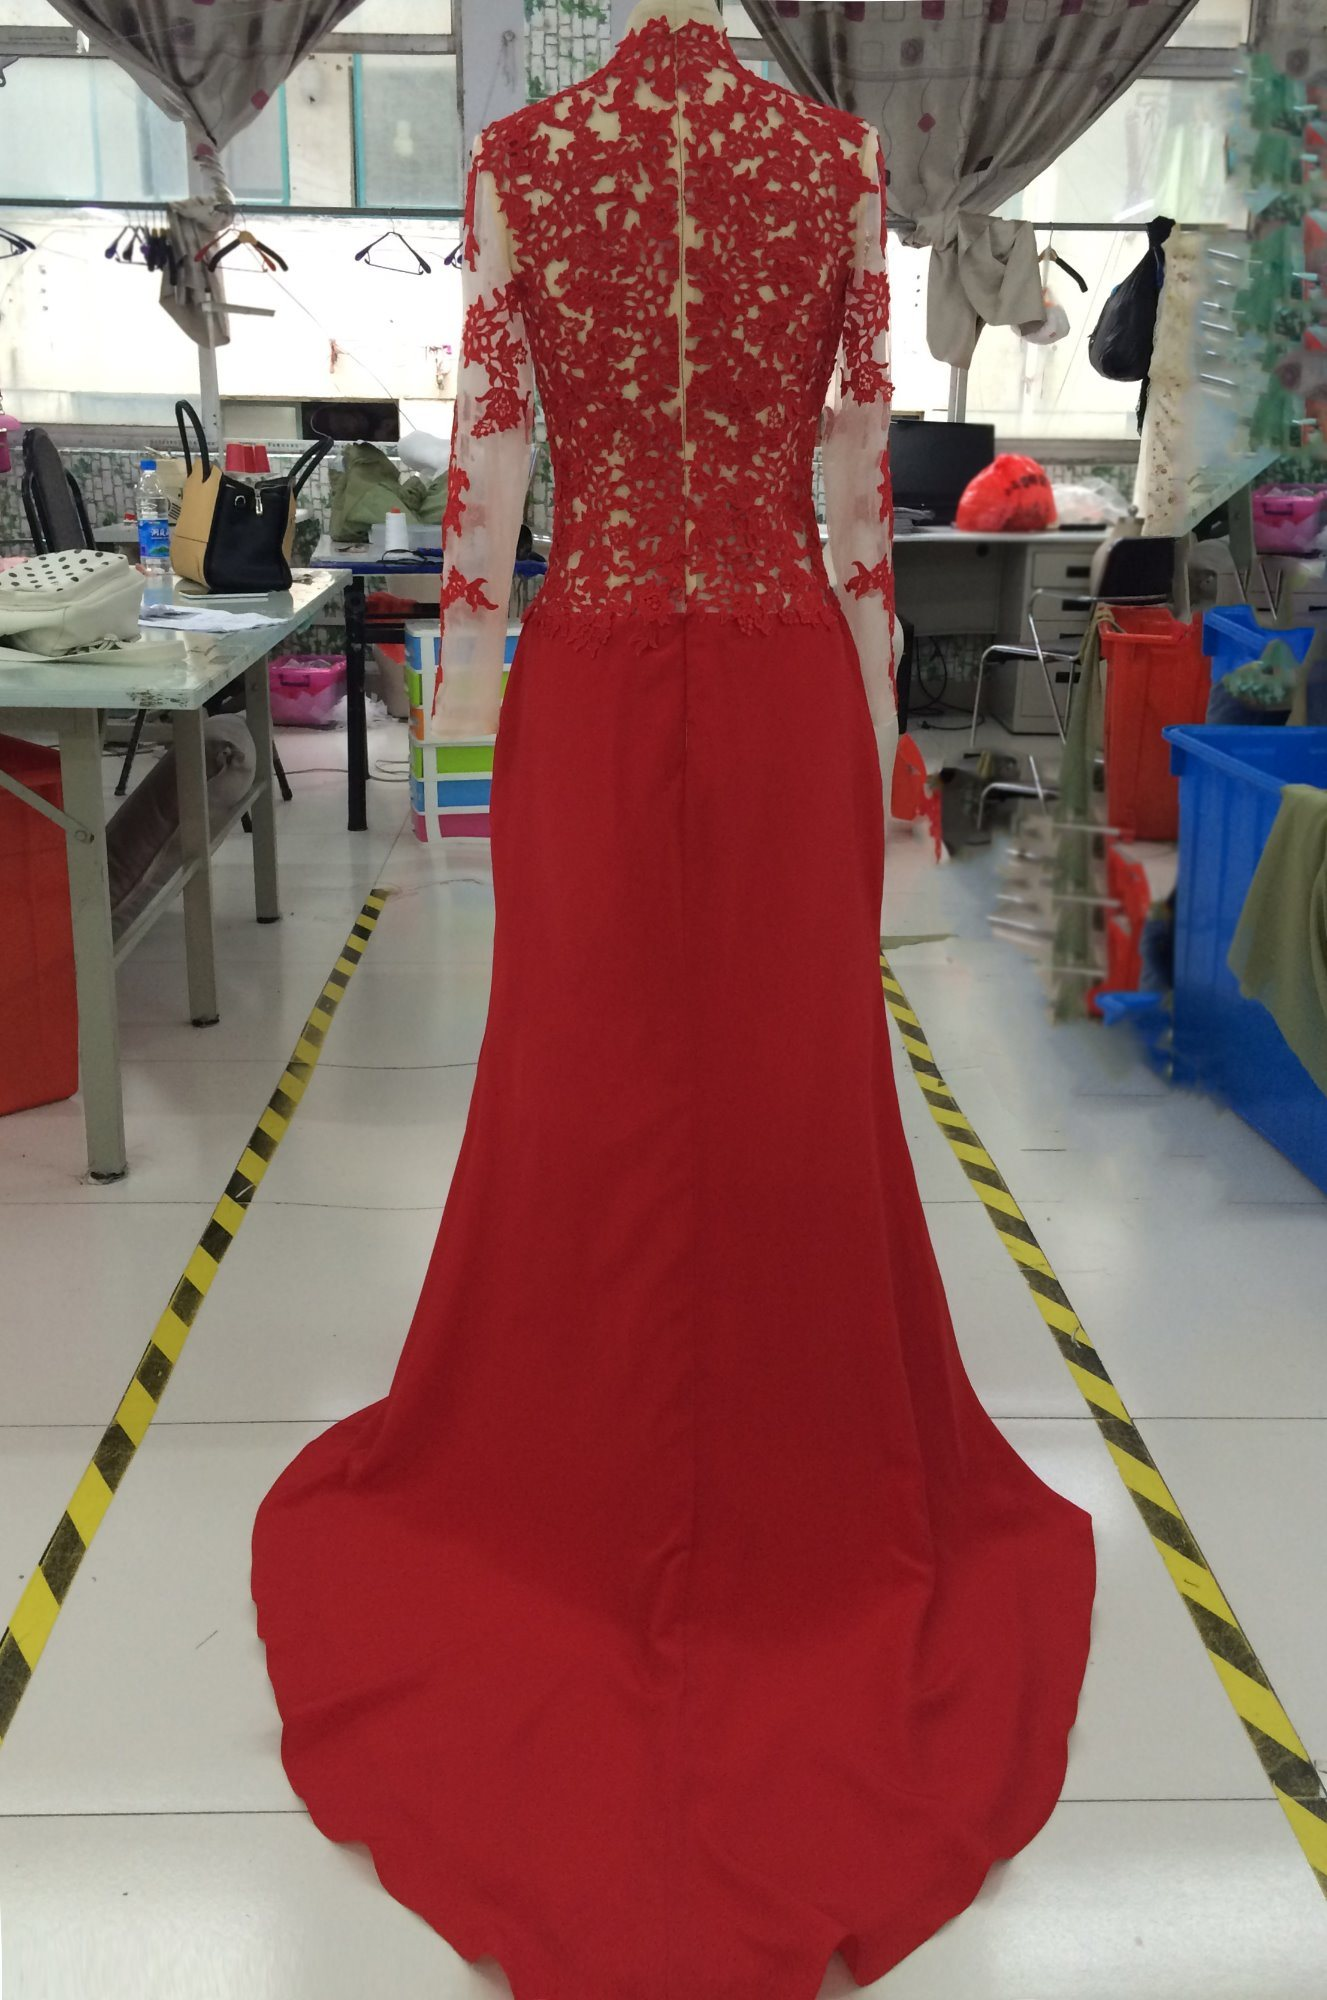 Aoliweiya Satin/Lace Ceremonial Clothing Evening Prom Dress